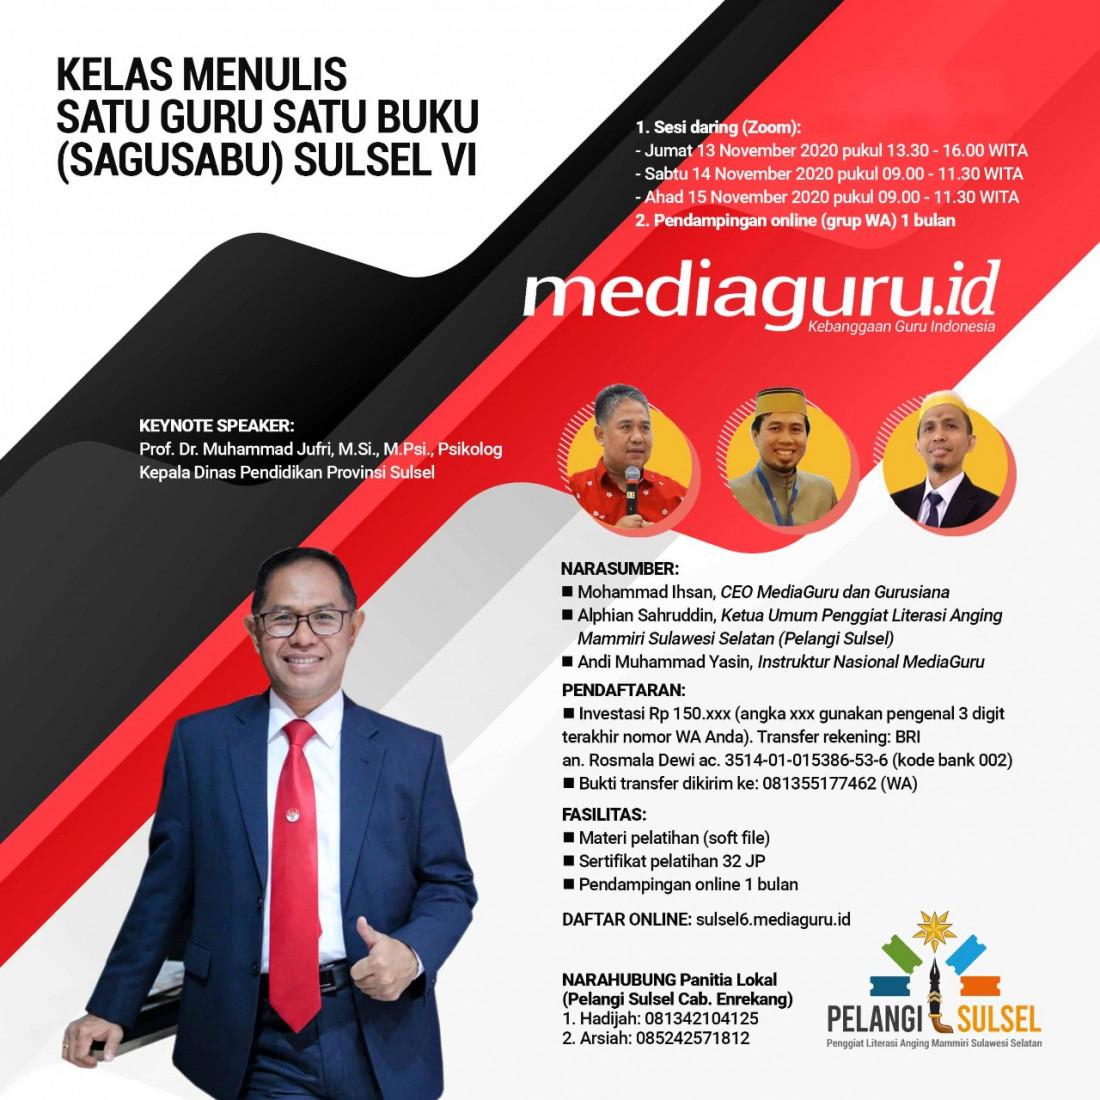 KELAS MENULIS SATU GURU SATU BUKU (SAGUSABU) PELANGI SULSEL (13-15 NOVEMBER 2020)